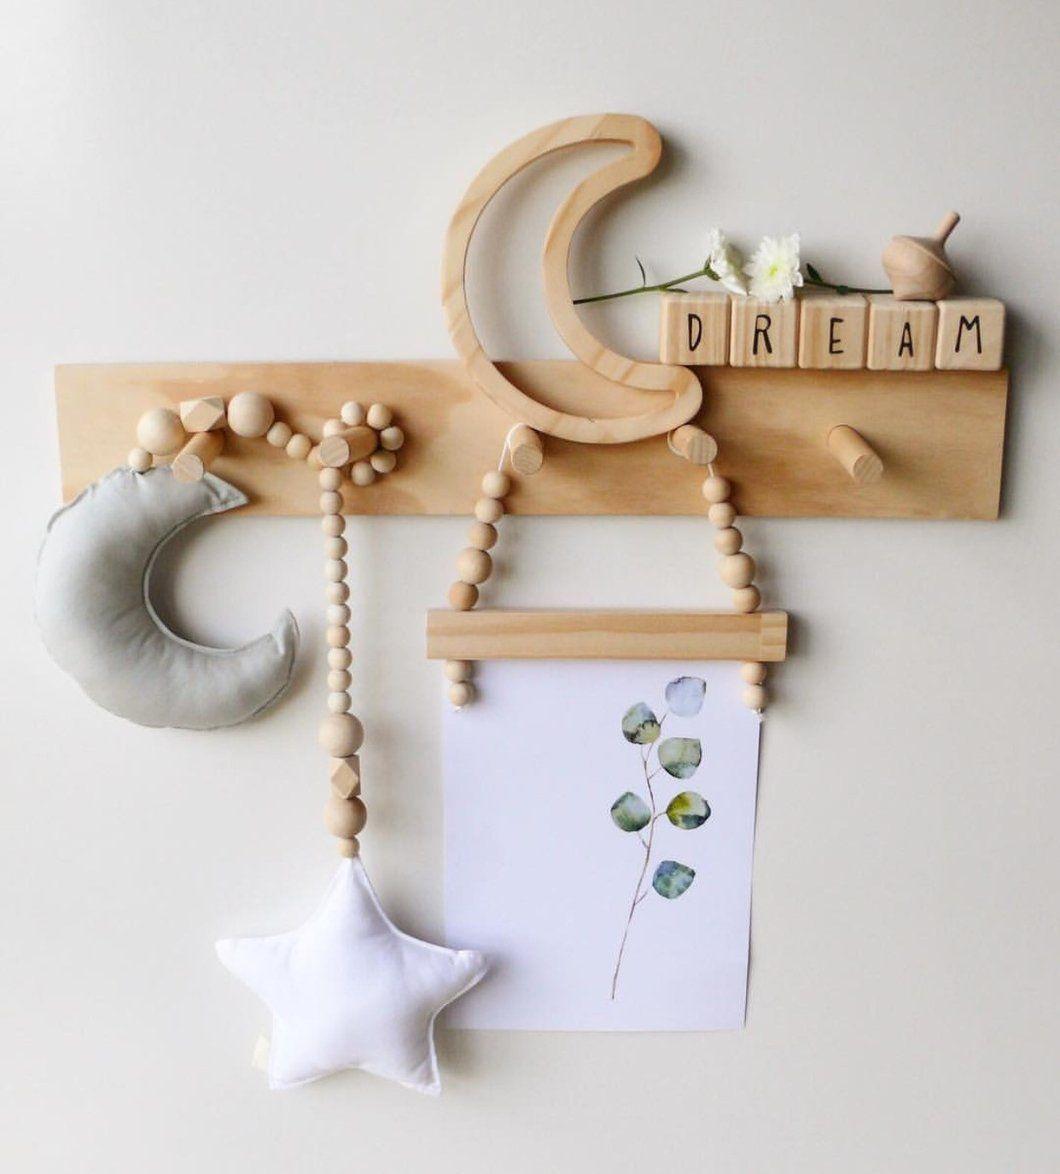 Tassel Wooden Beads Car hanging Wall Hanging Pendant Natural Wood Nursery Room